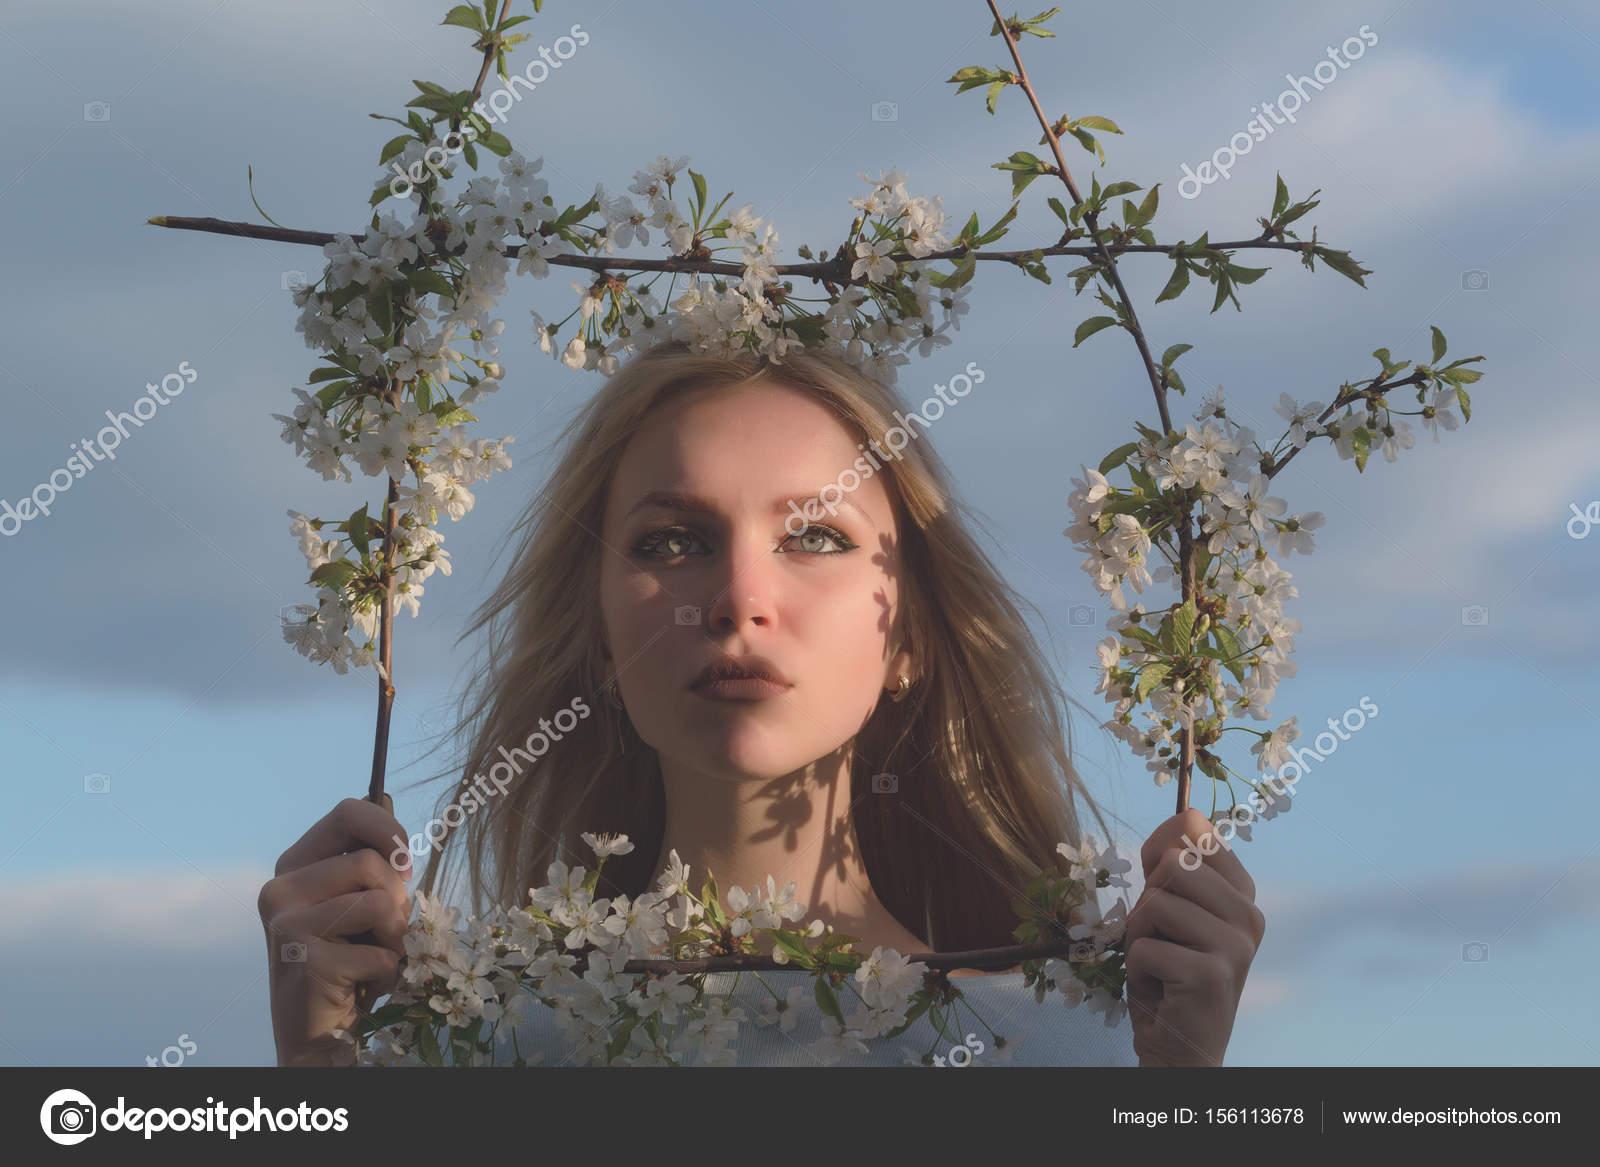 chica posando con cara bonita en marco floral — Fotos de Stock ...